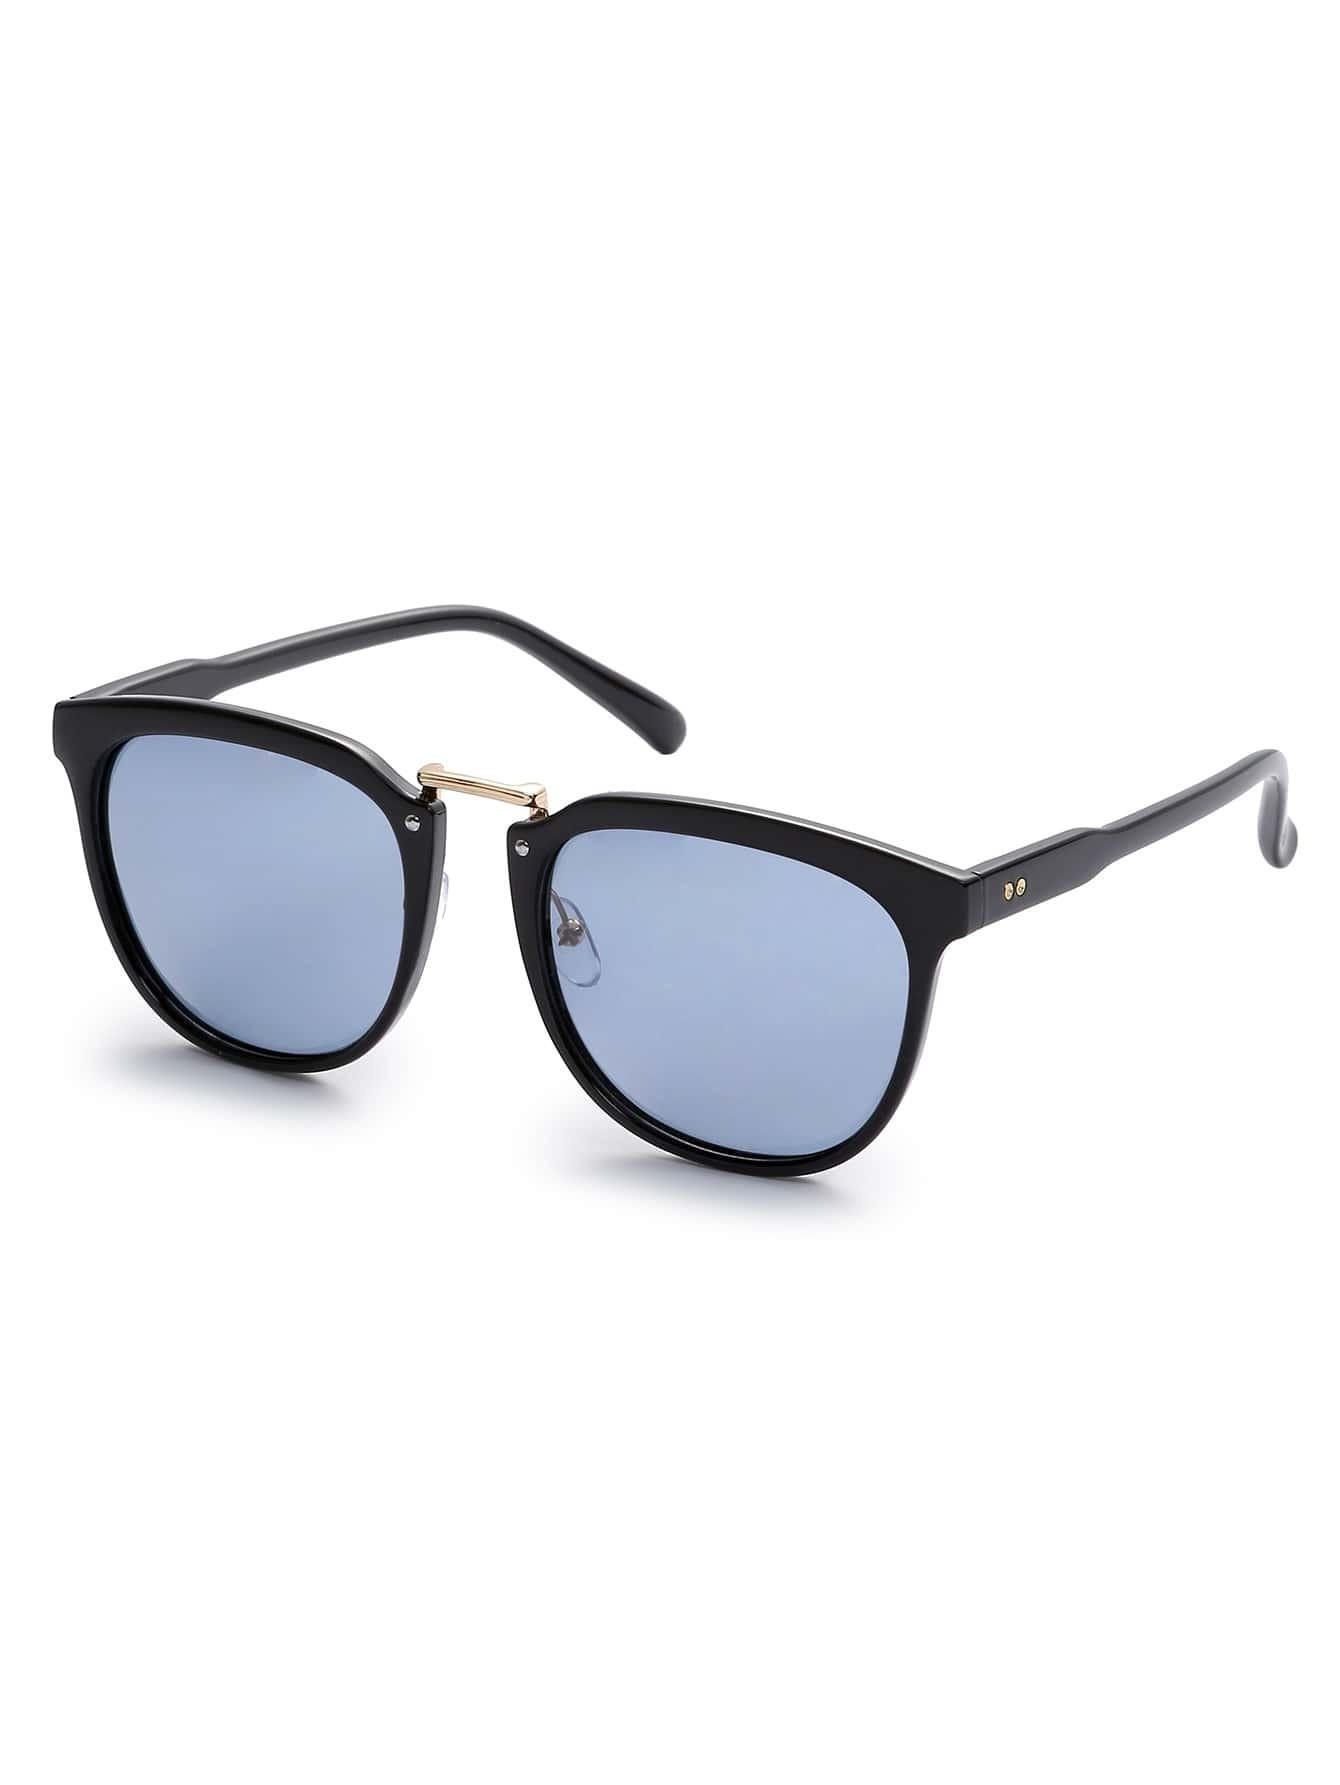 Golden Frame Black Sunglasses : Black Frame Gold Metal Bridge Grey Lens Sunglasses